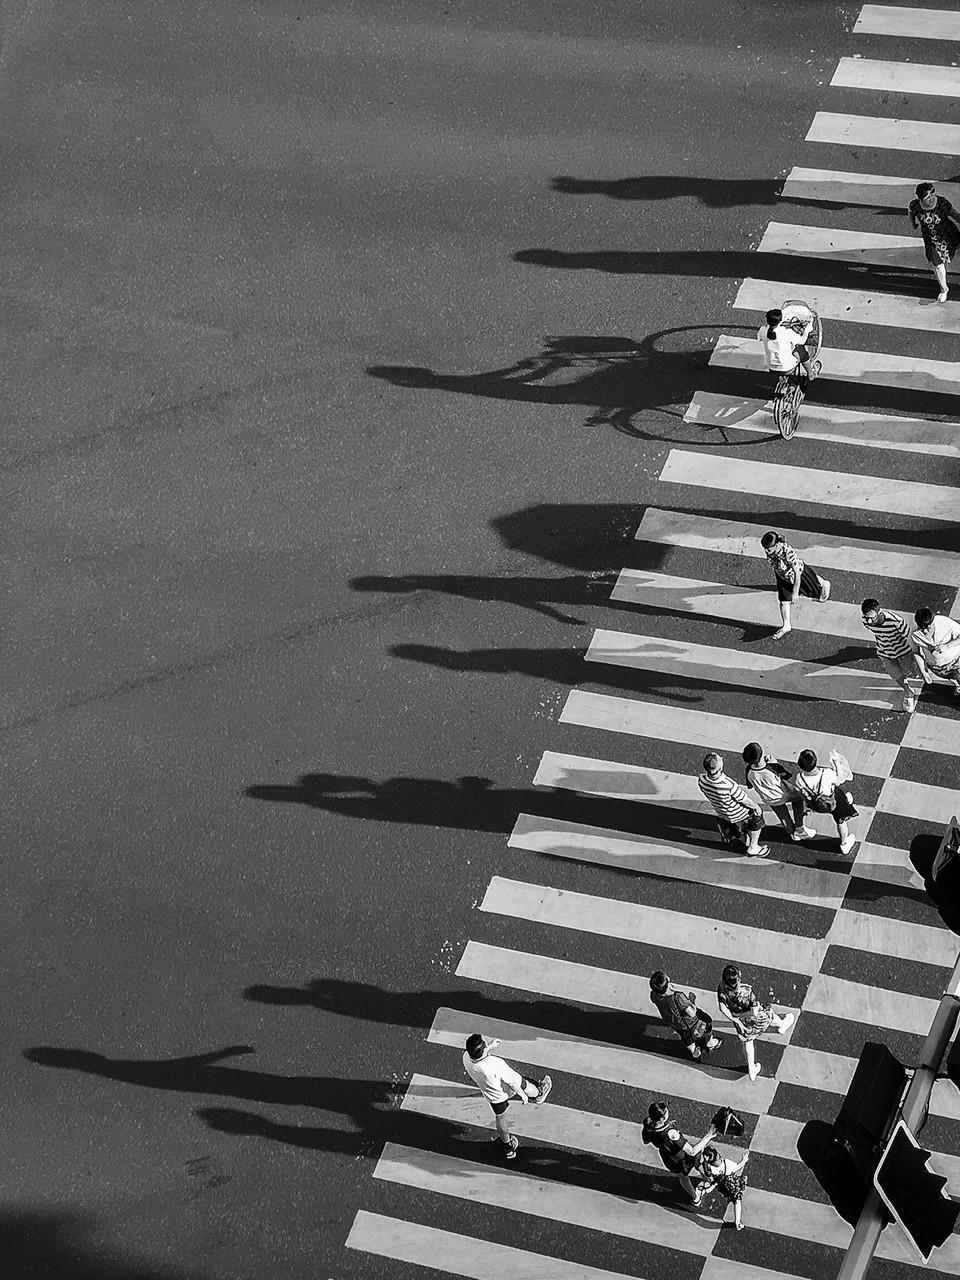 城市节拍, © 新影像7666, Huawei Next-Image Awards